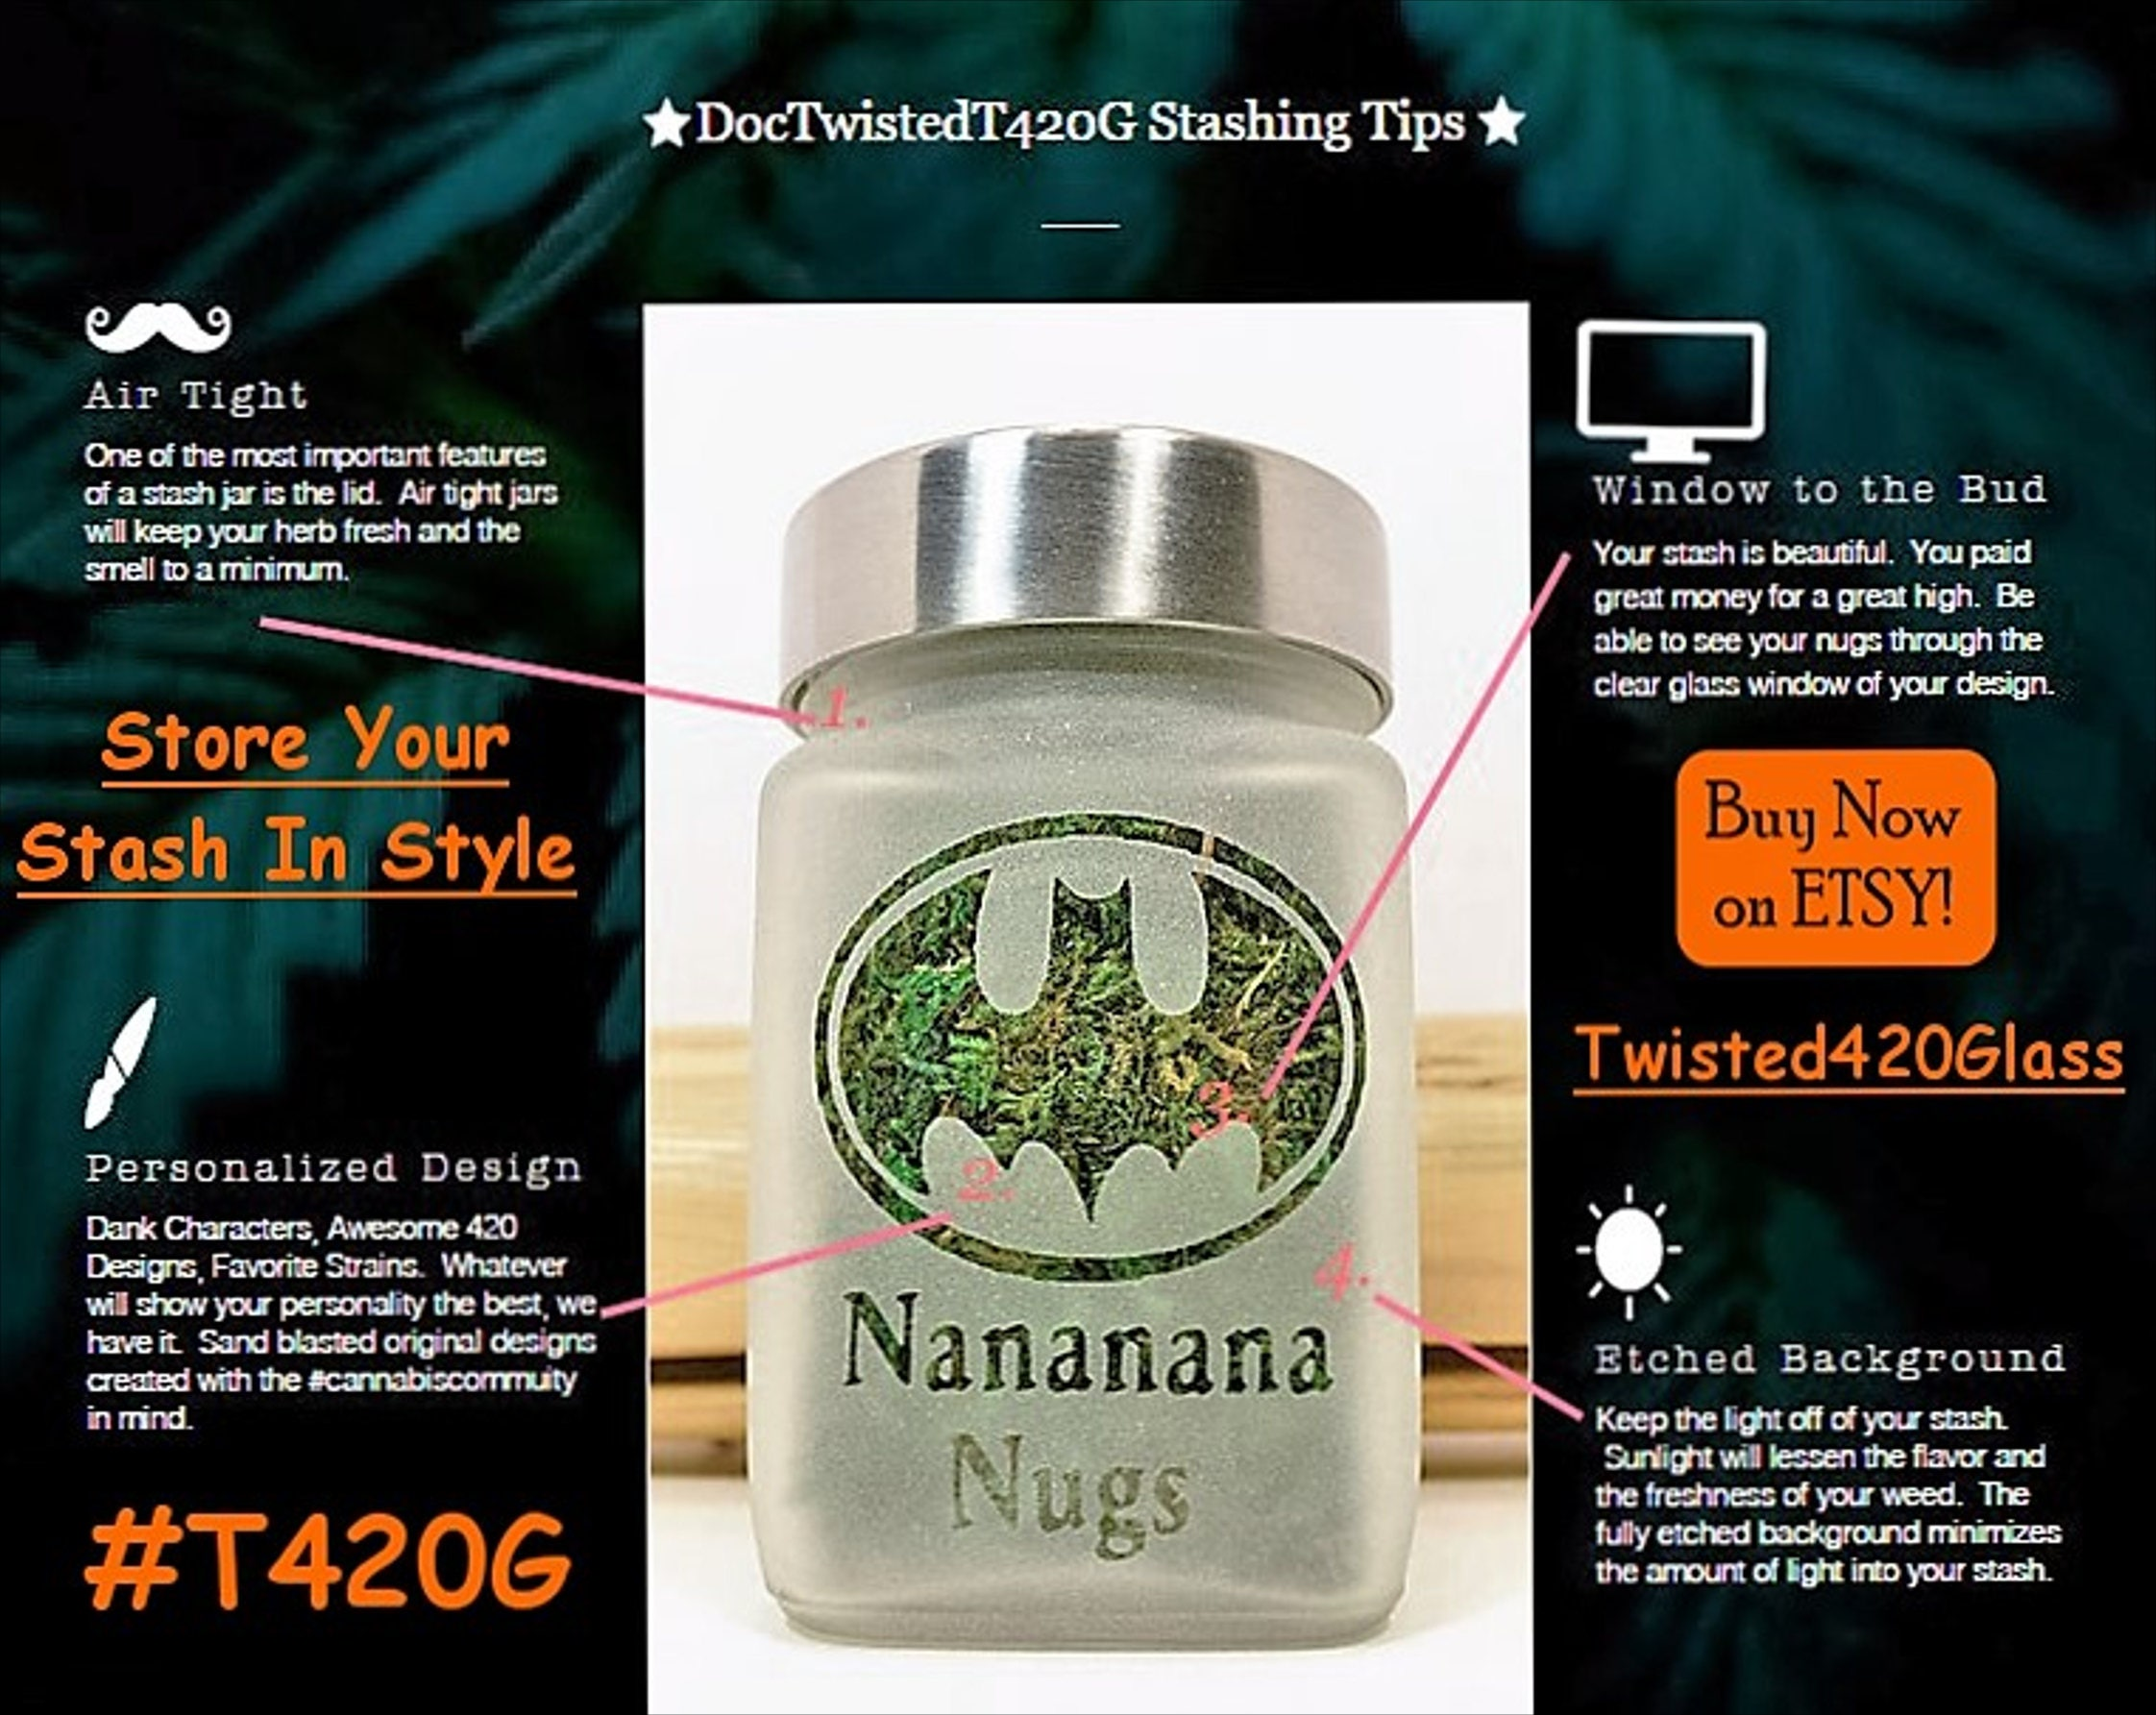 Devil Stash Jar Weed Accessories Stoner Gifts And Stash Jars Ganja Gift Ideas 420 Weed Jars Stoner Accessories